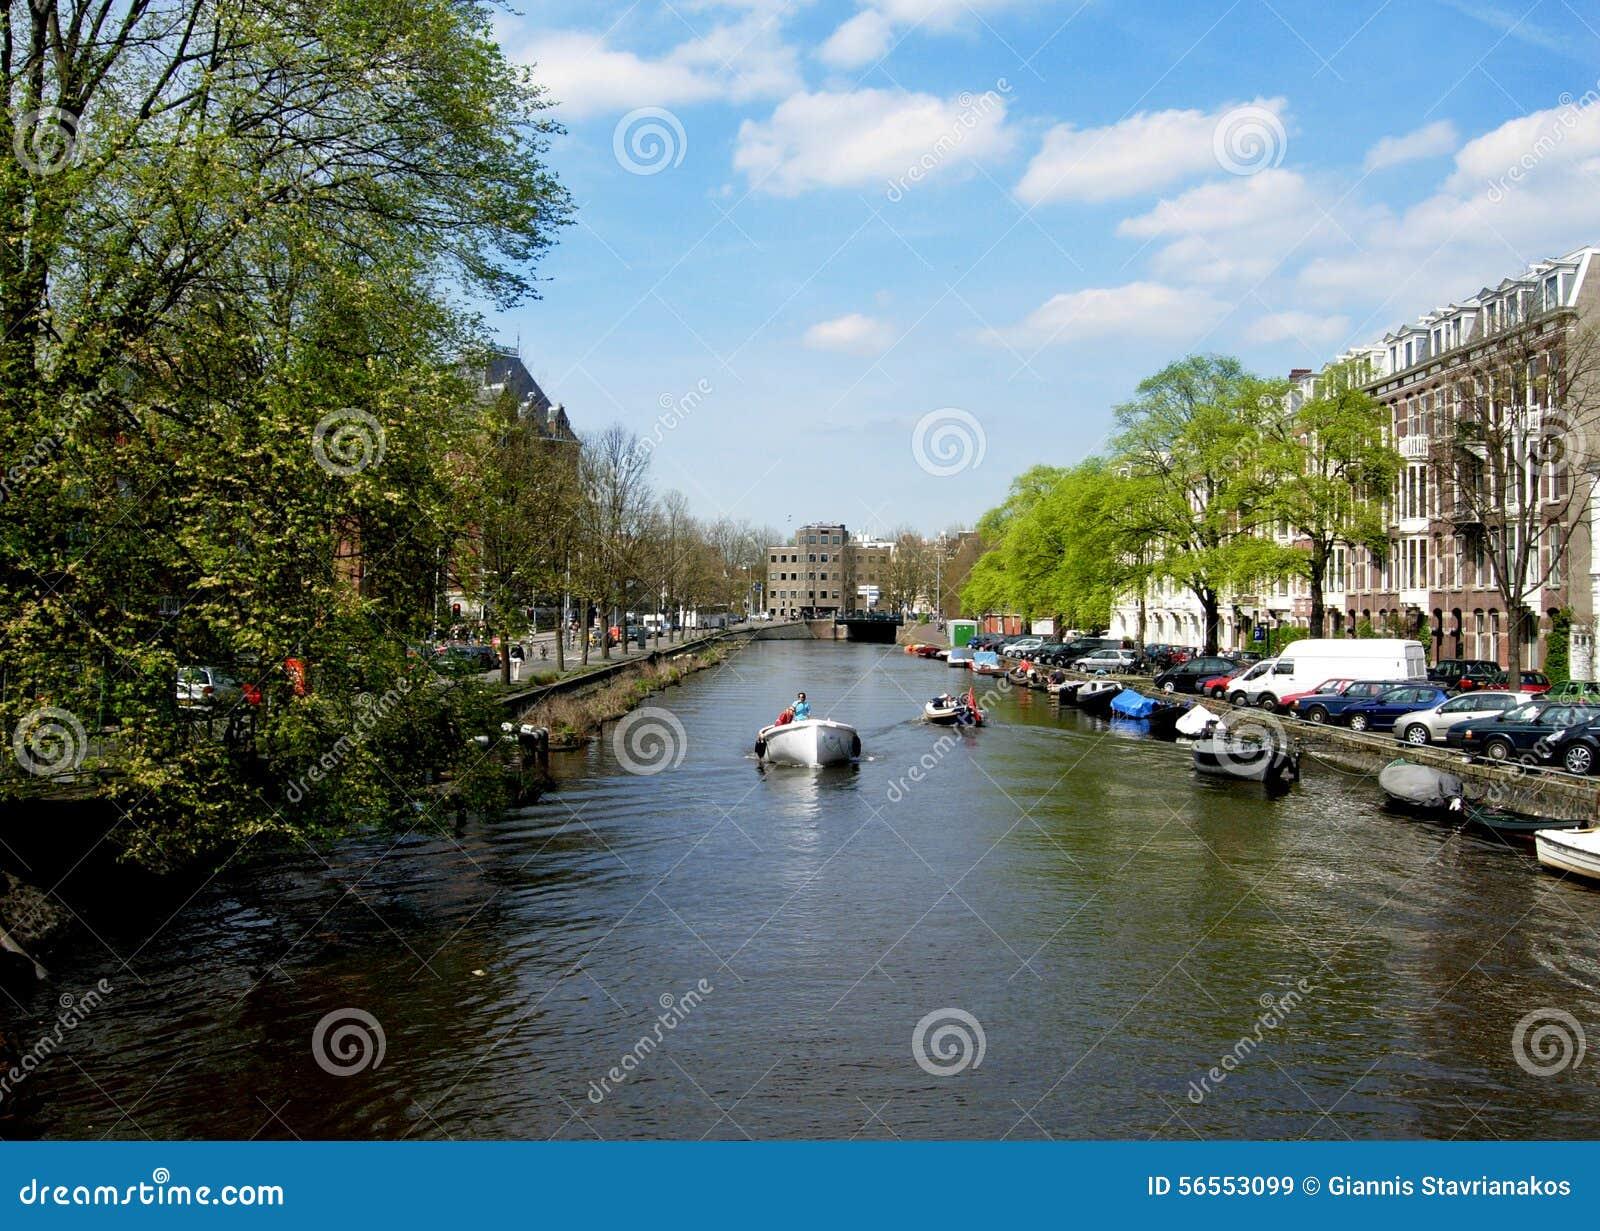 Download Κανάλια του Άμστερνταμ στις Κάτω Χώρες Εκδοτική Στοκ Εικόνα - εικόνα από τουρισμός, κανάλια: 56553099